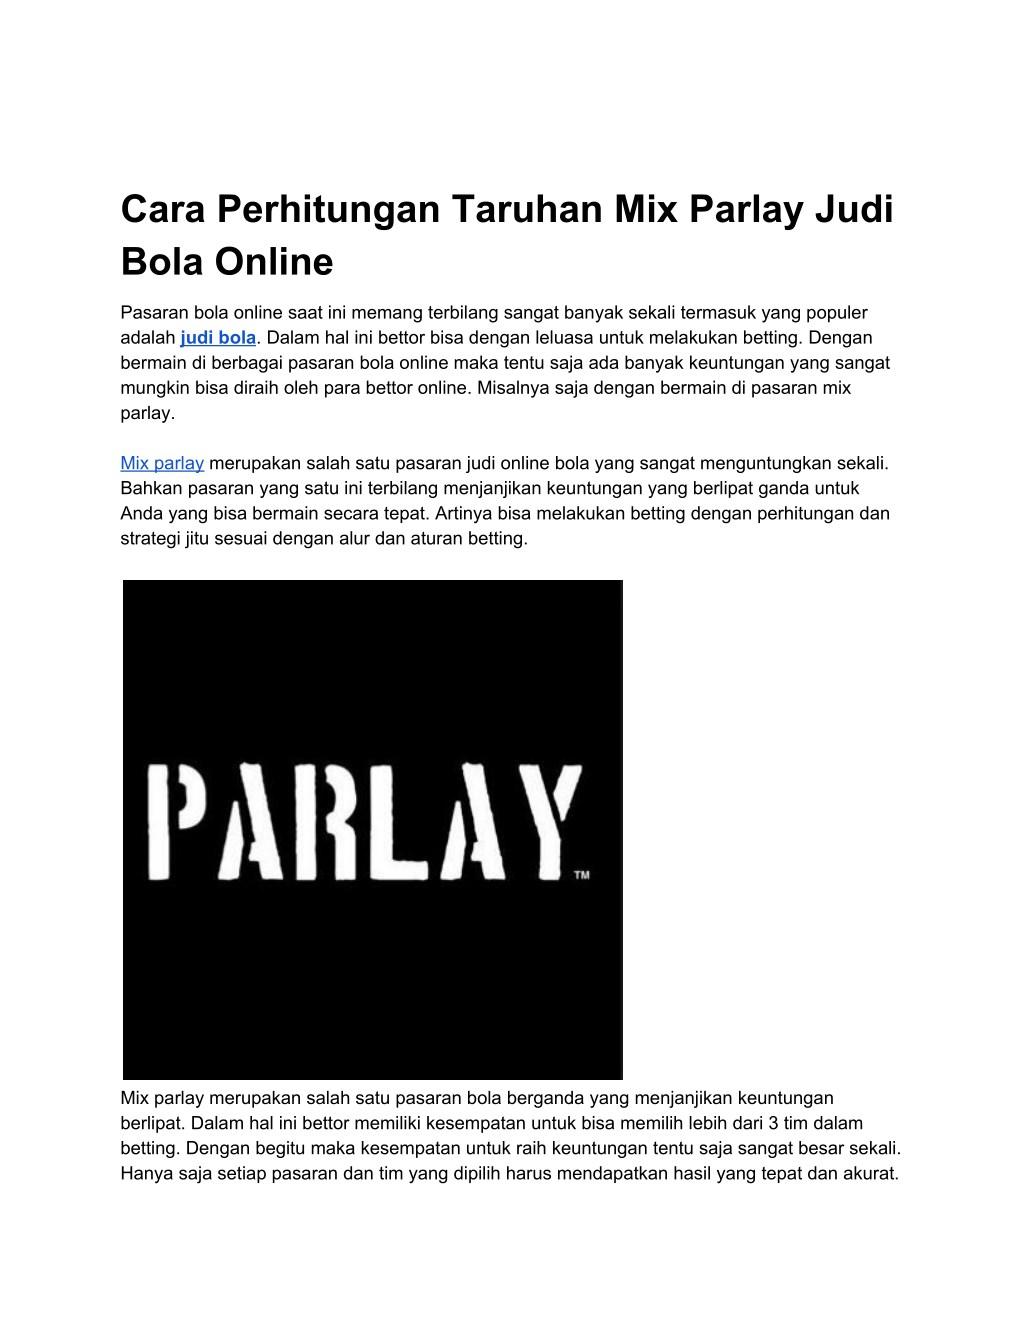 Ppt Cara Perhitungan Taruhan Mix Parlay Judi Bola Online Powerpoint Presentation Id 7962191